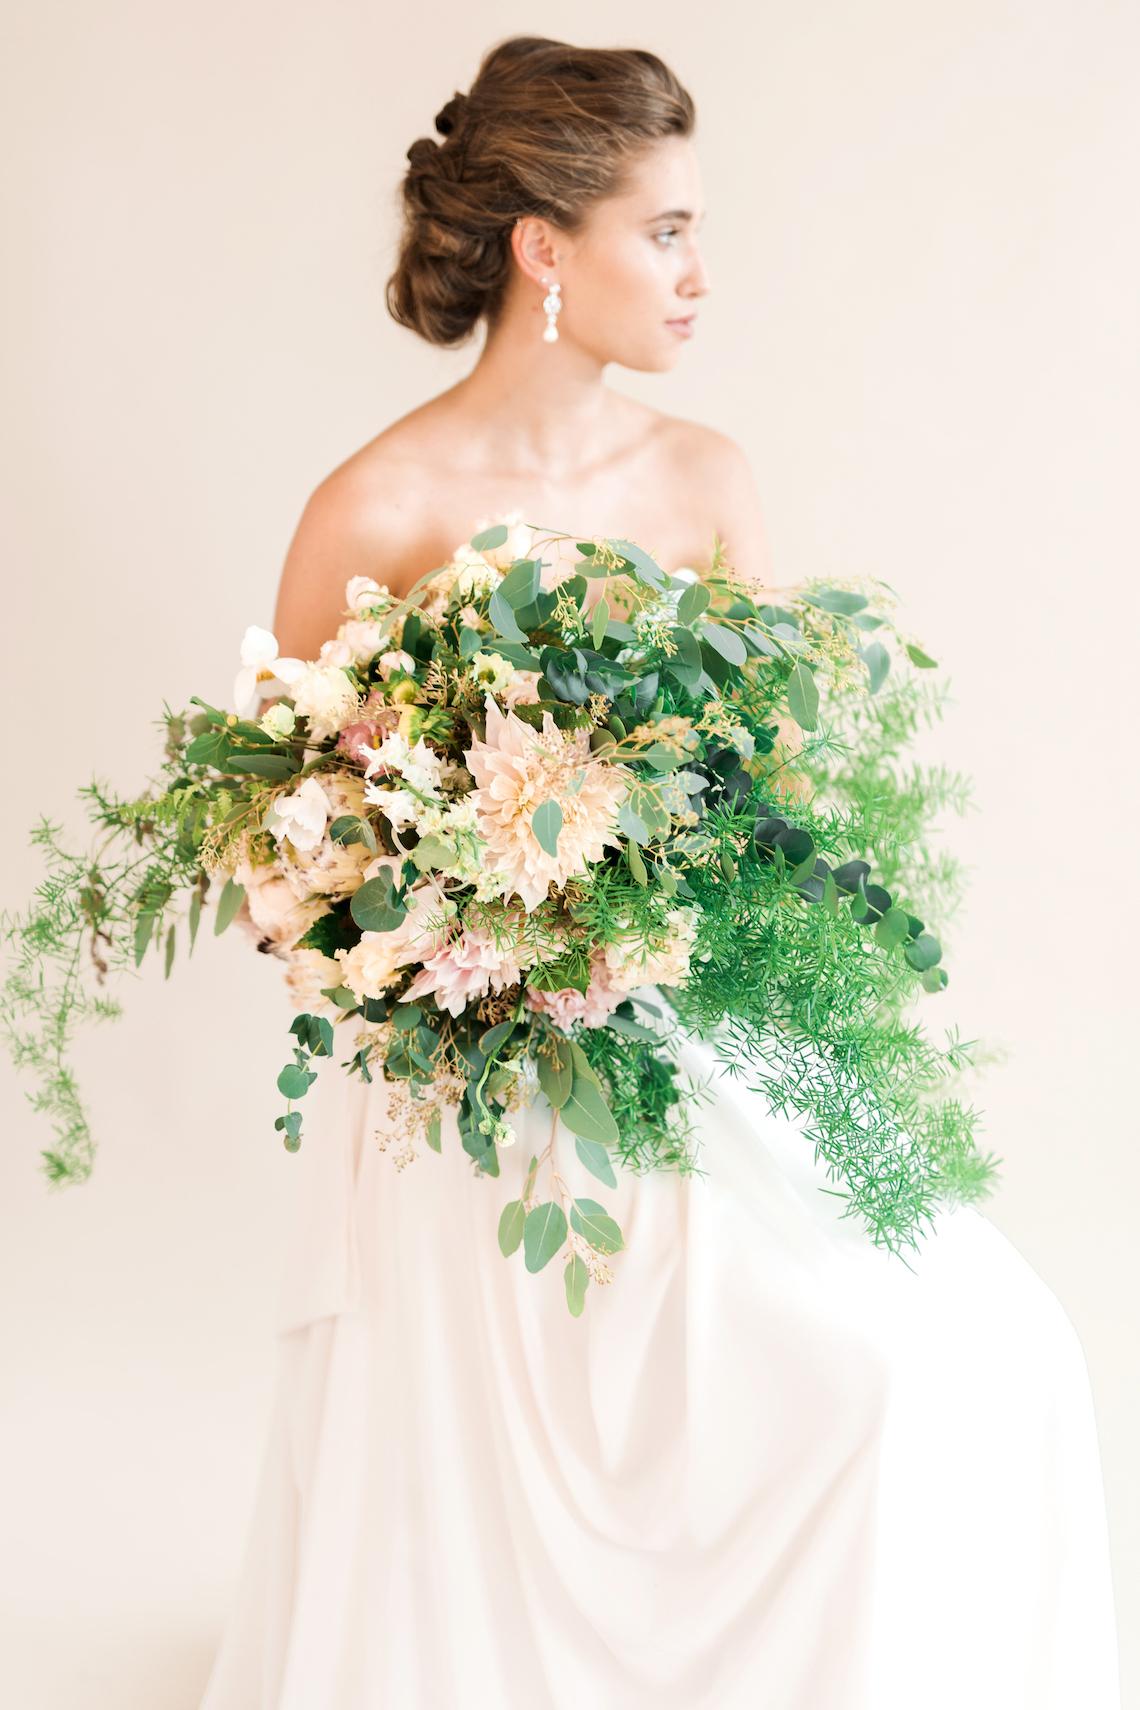 Soft & Dreamy Bridal Fashion Inspiration | Emma Pilkington 11